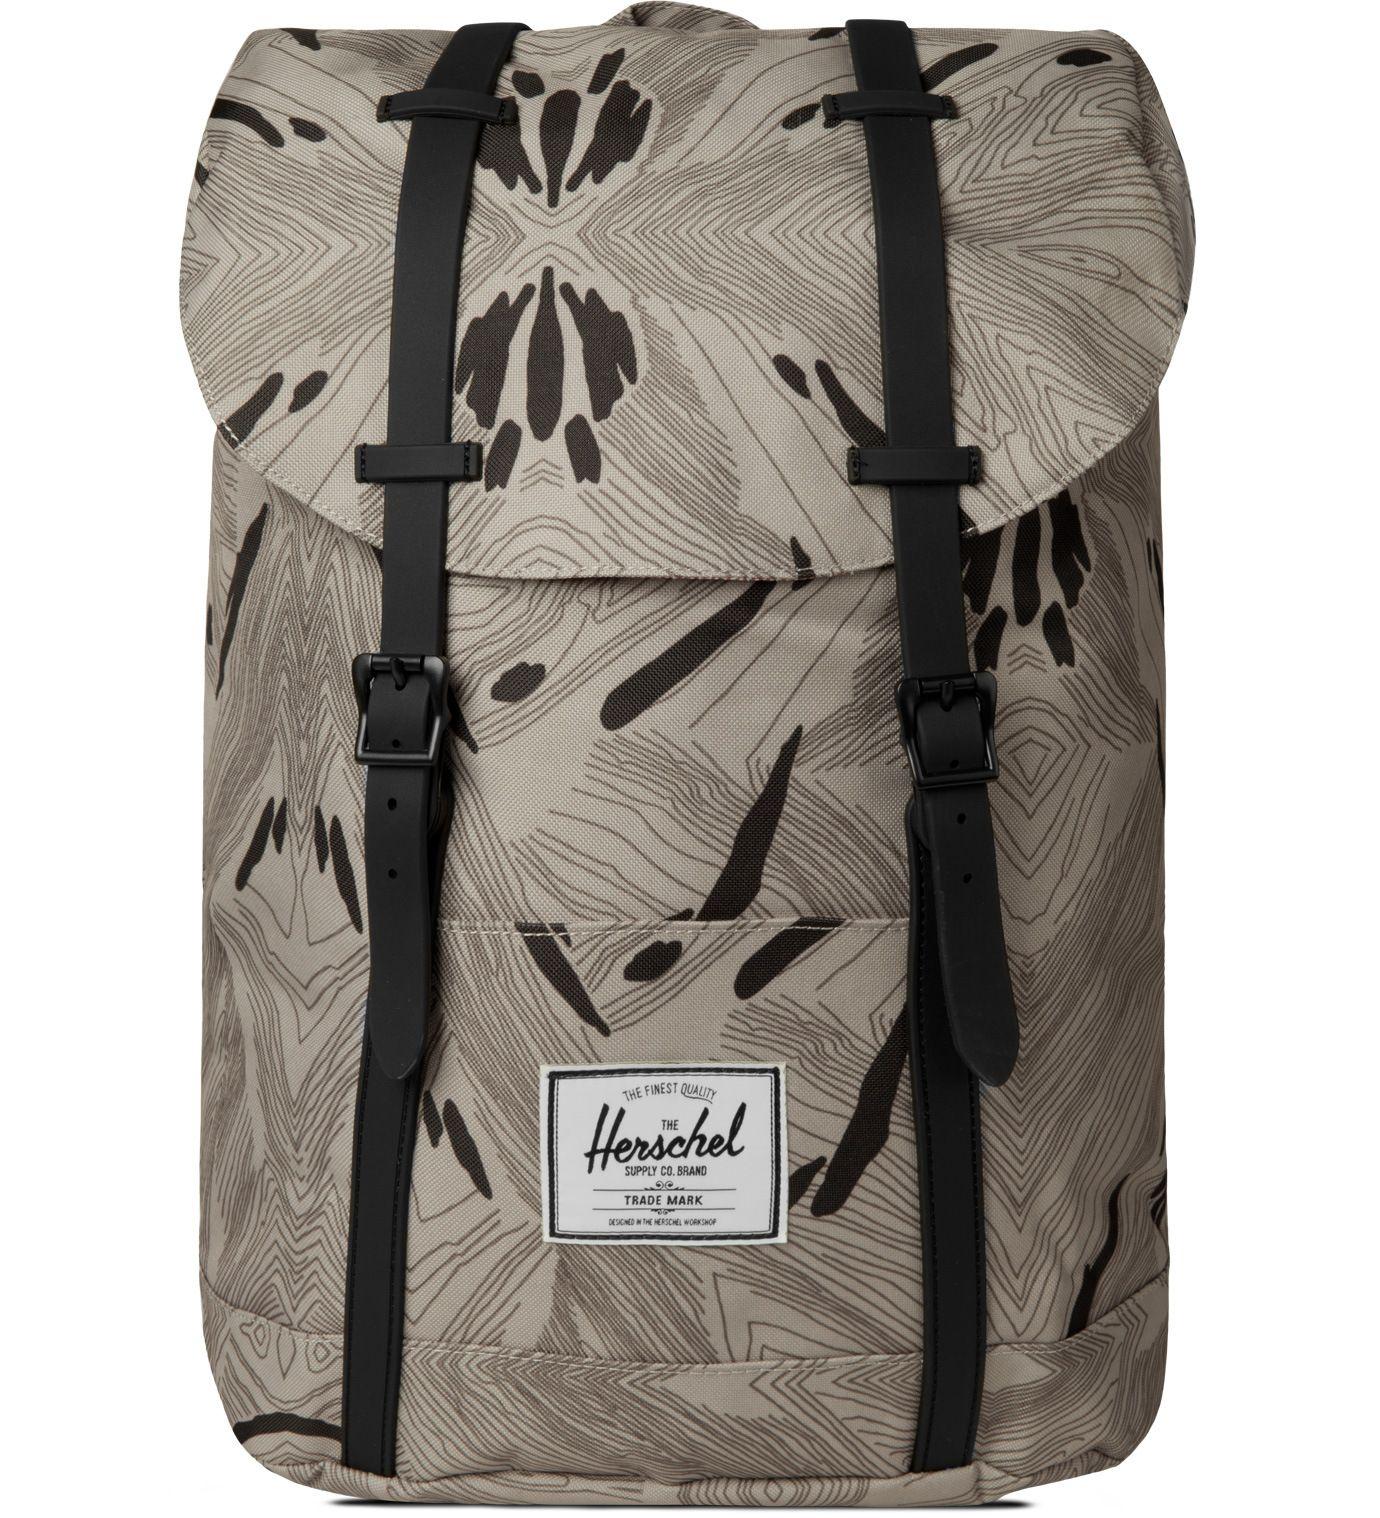 Herschel Supply Co. Geo Black Rubber Retreat Backpack   HYPEBEAST Store.  Shop Online for Men s Fashion, Streetwear, Sneakers, Accessories c9431a173a